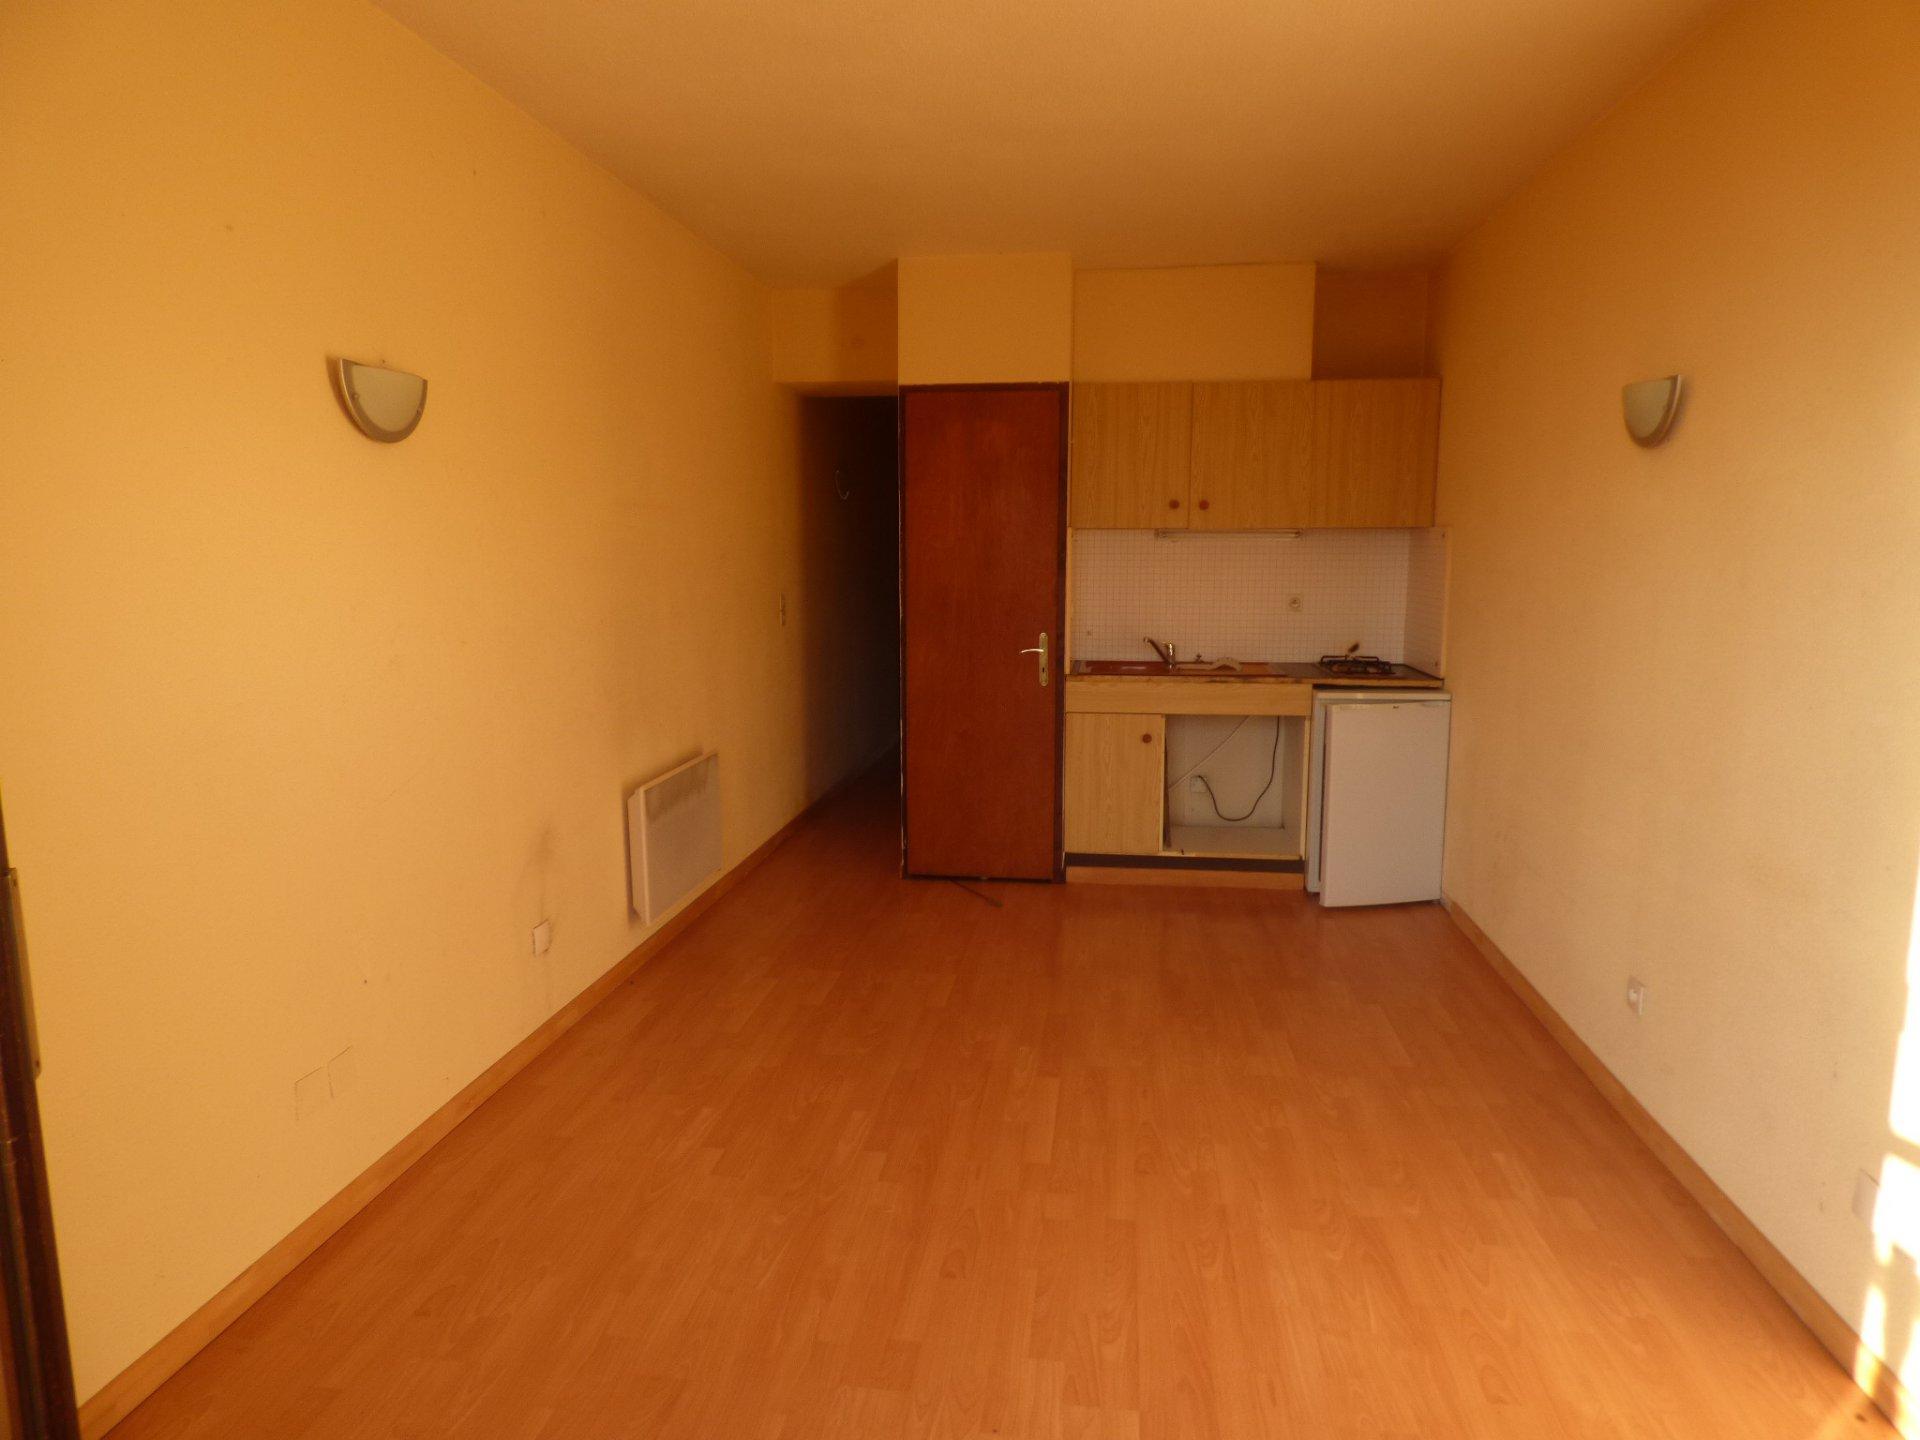 Appartement type 1 avec balcon